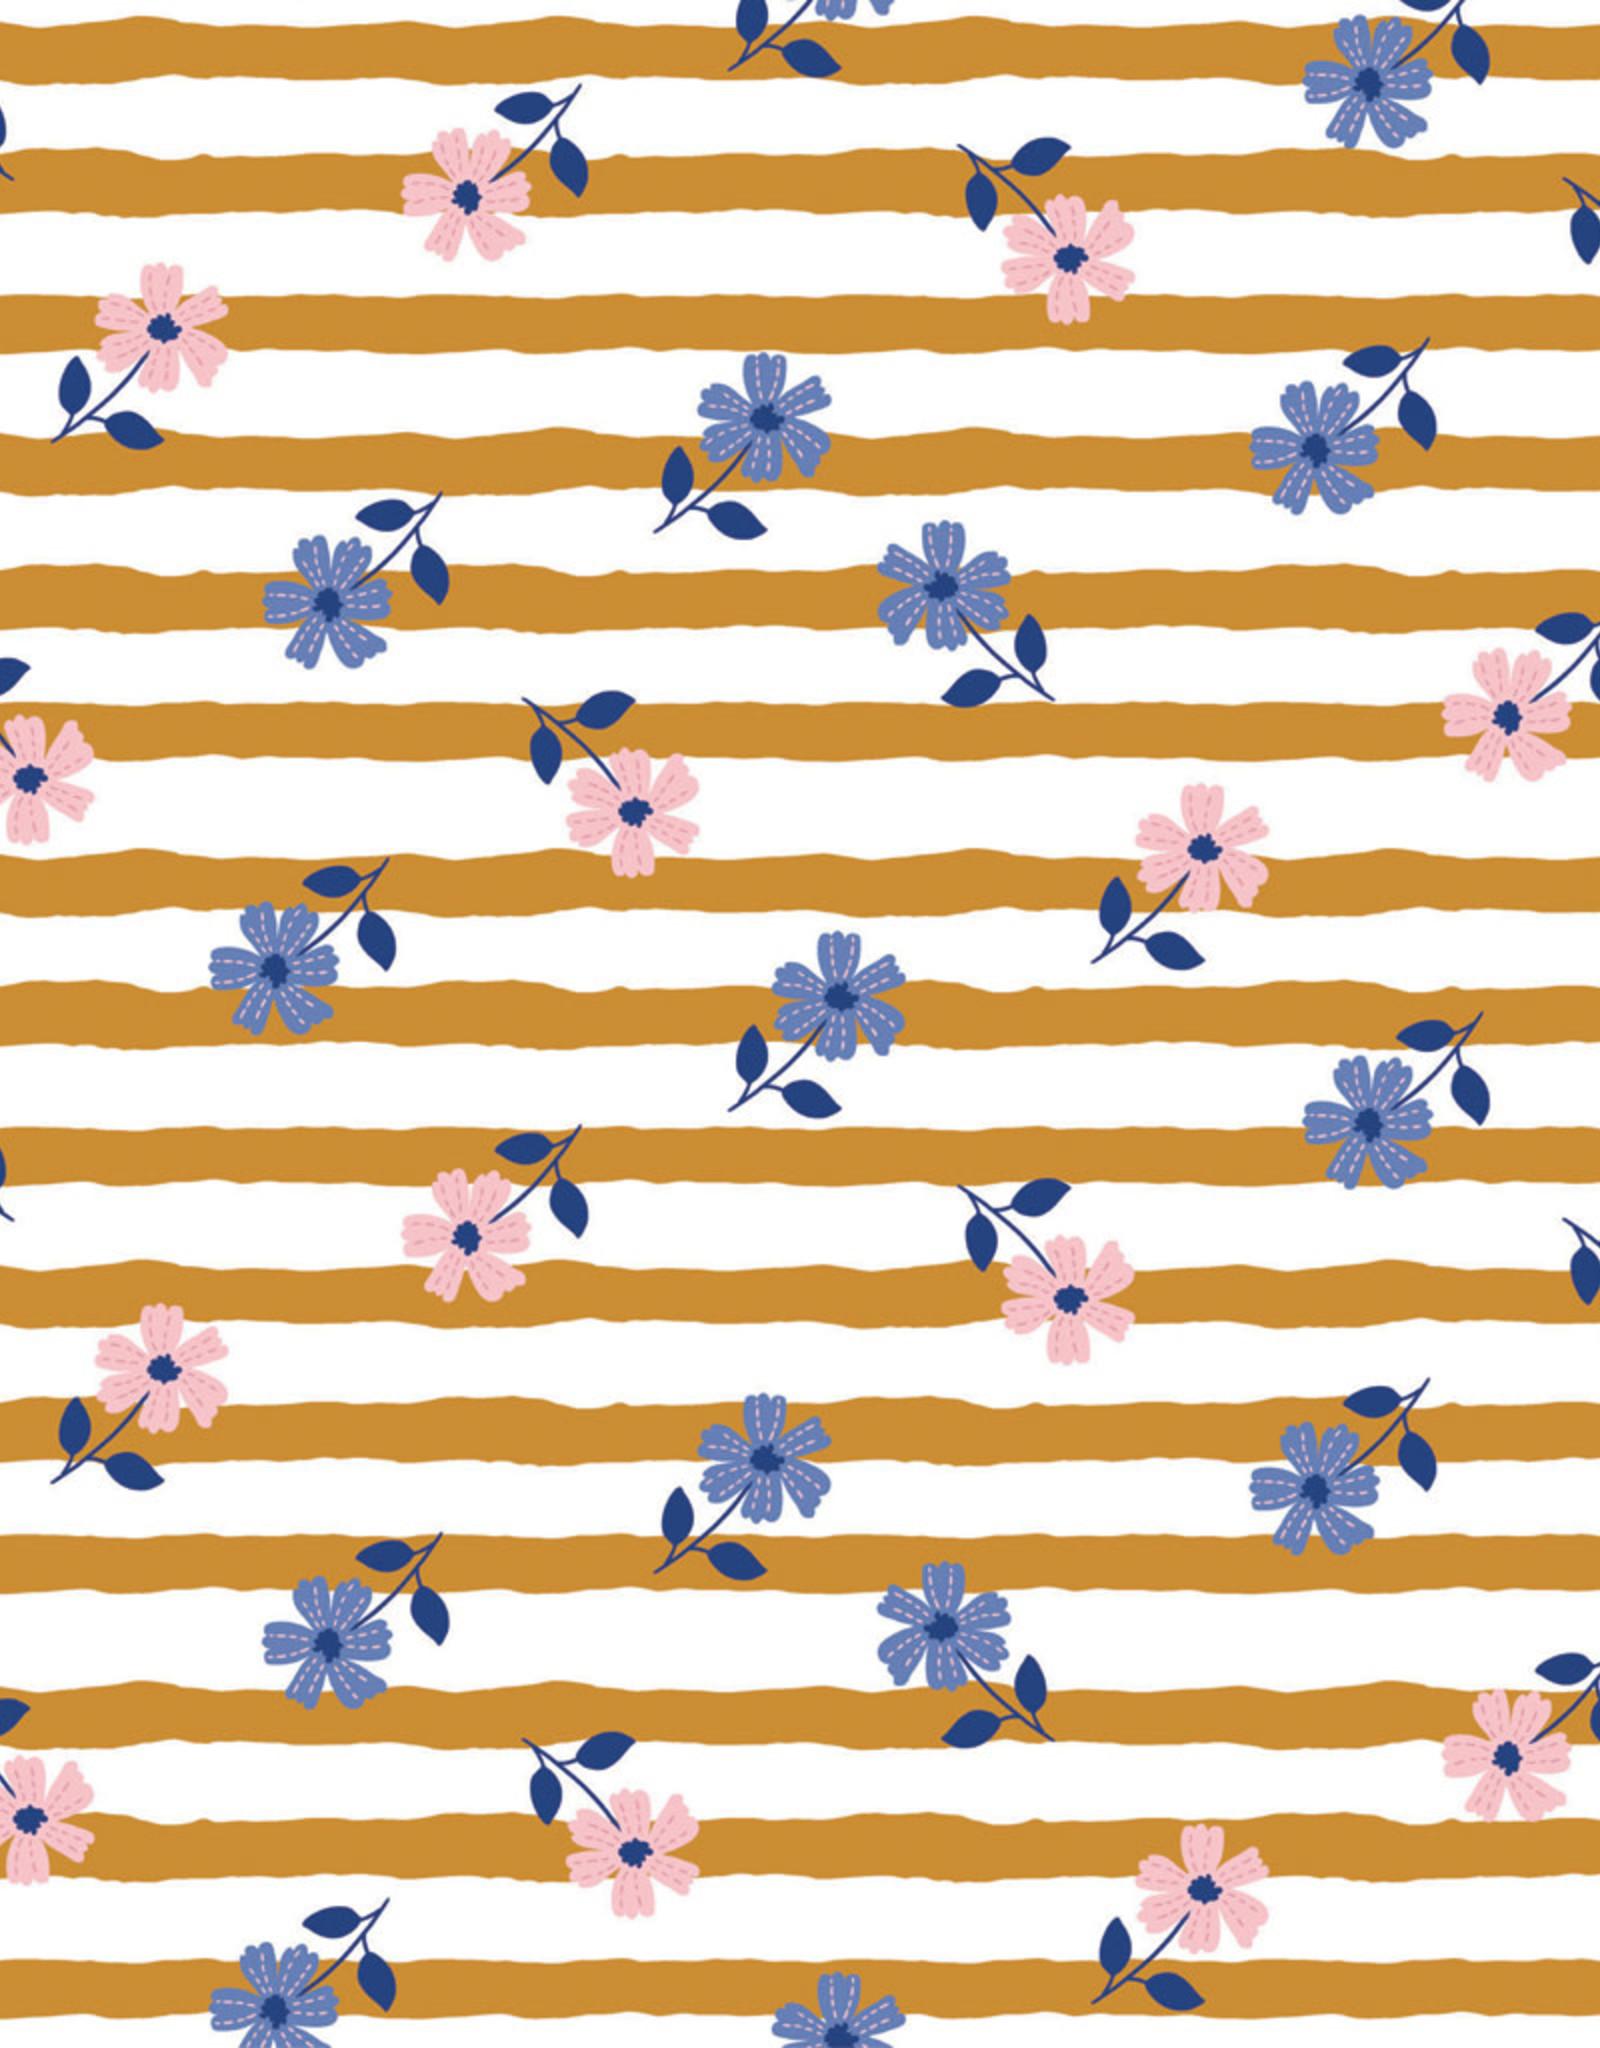 French Terry - Flowery Stripes Ochre